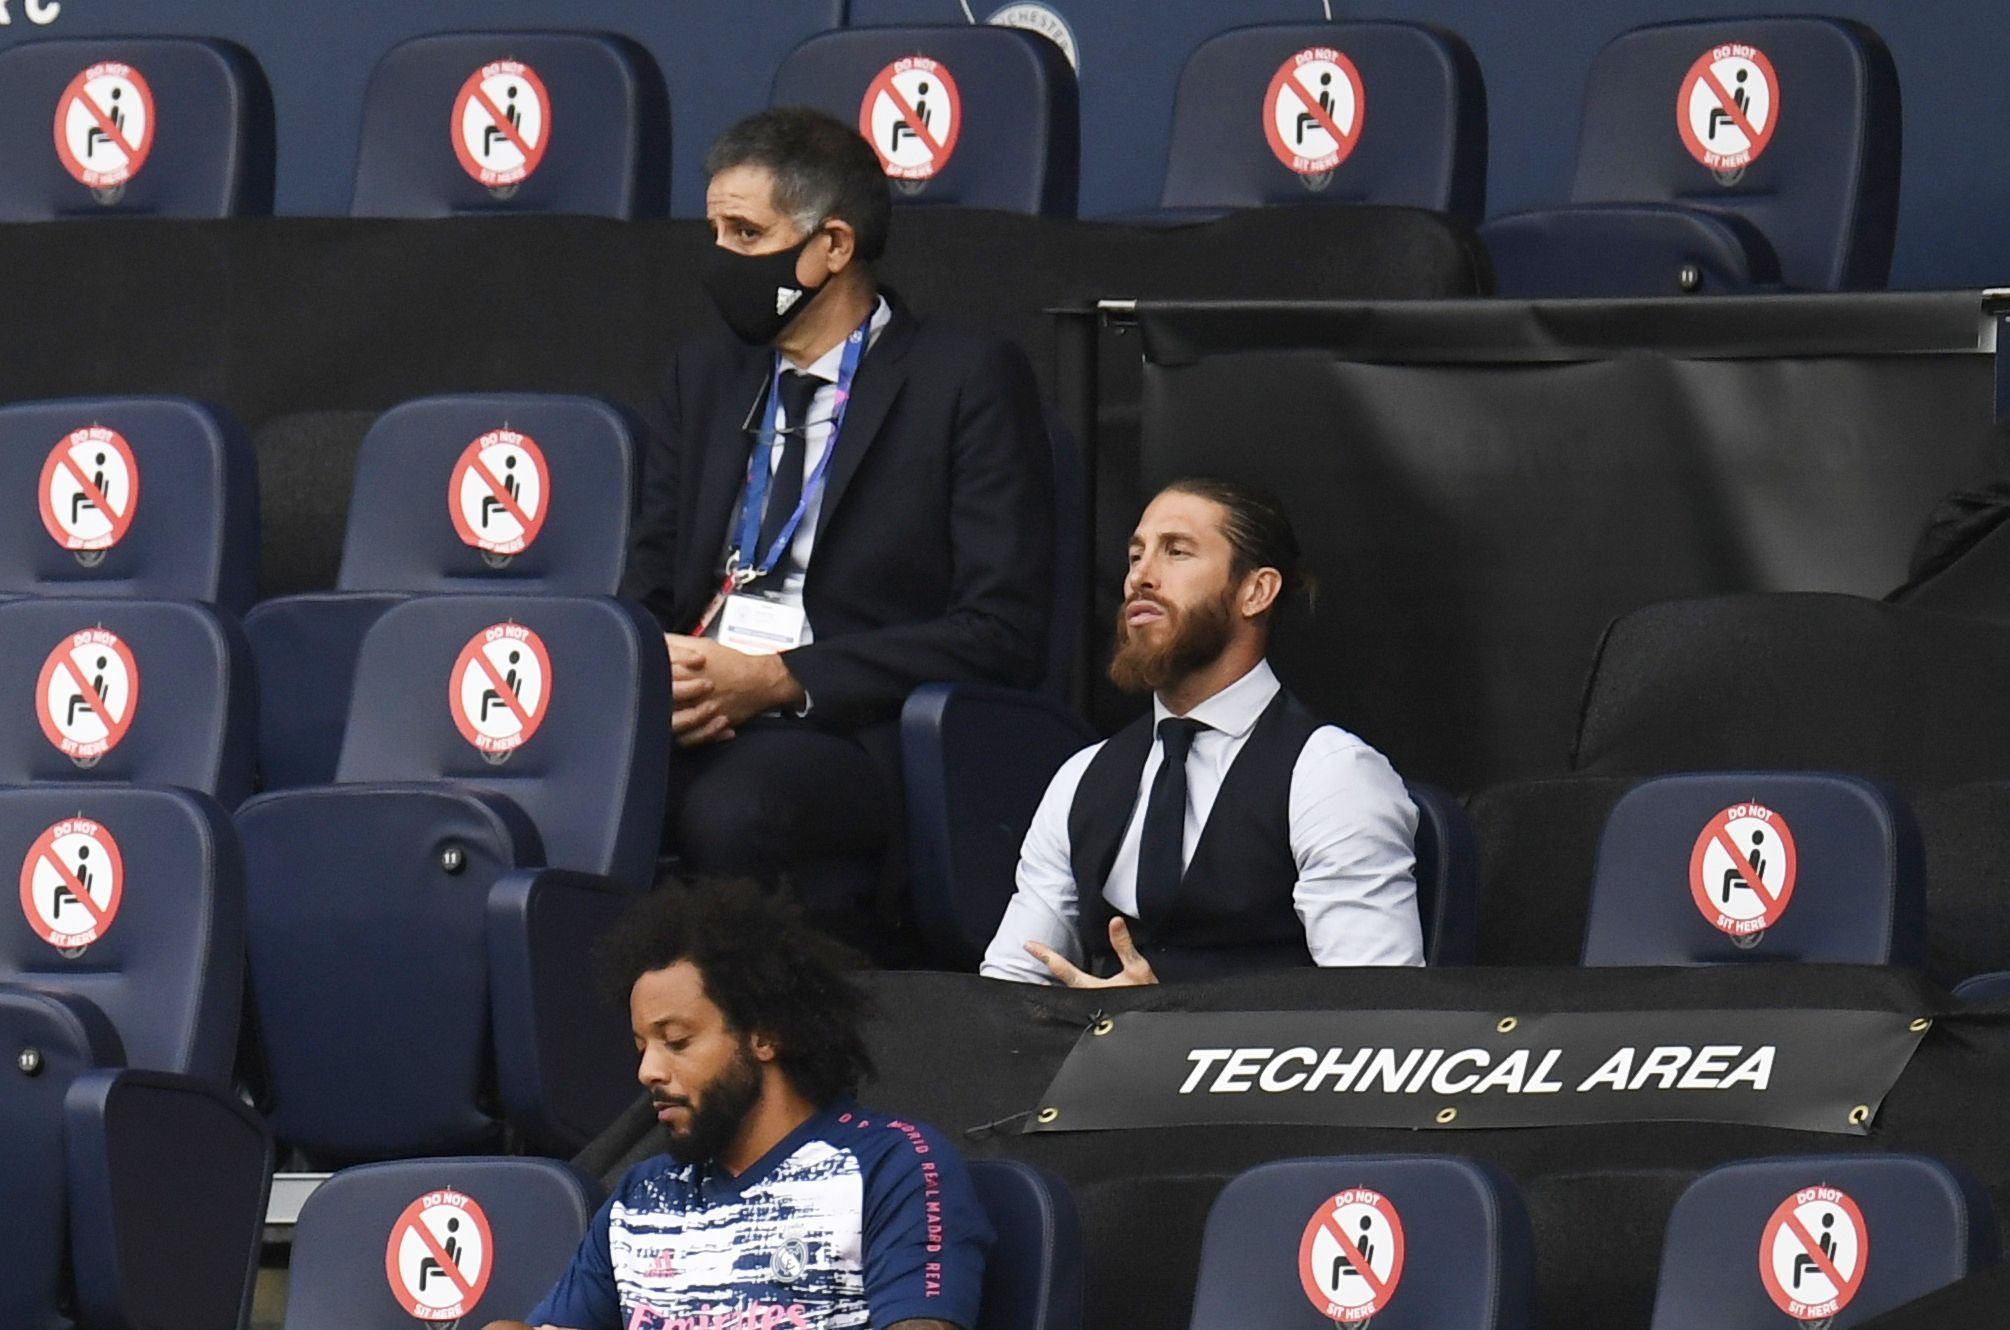 El capitán no pudo disputar el partido de vuelta - REUTERS/Peter Powell